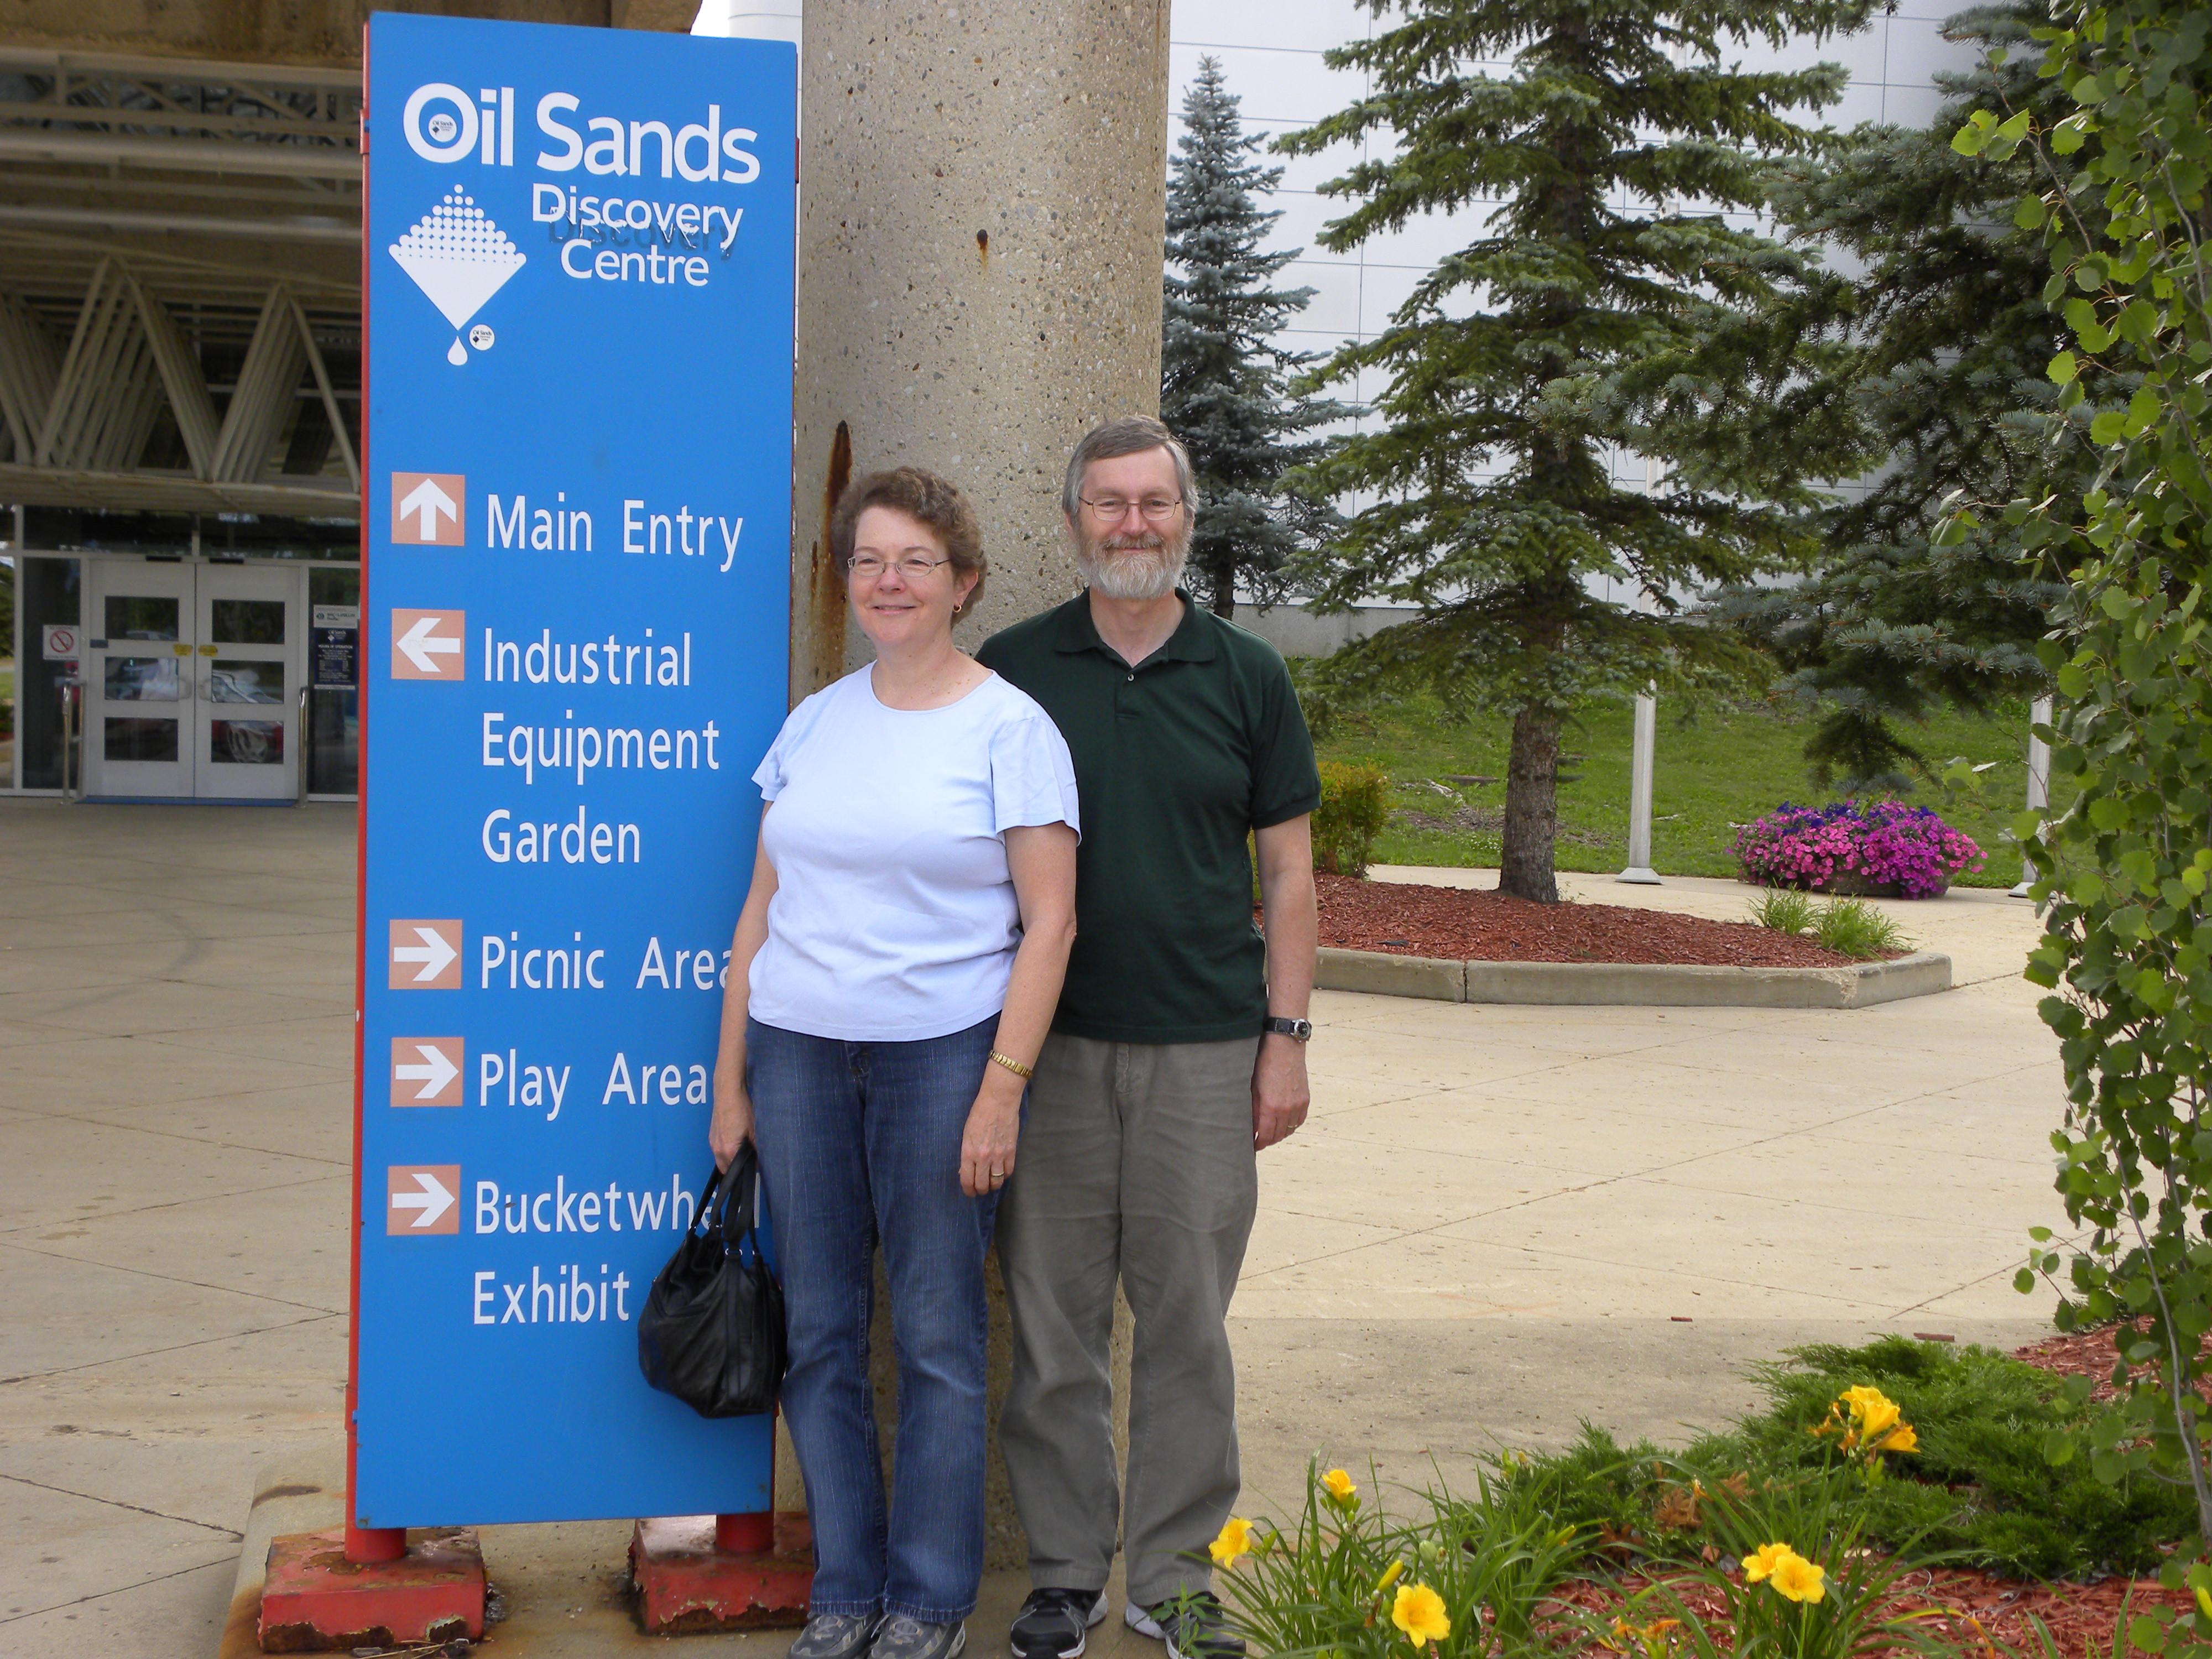 Oil Sands Museum